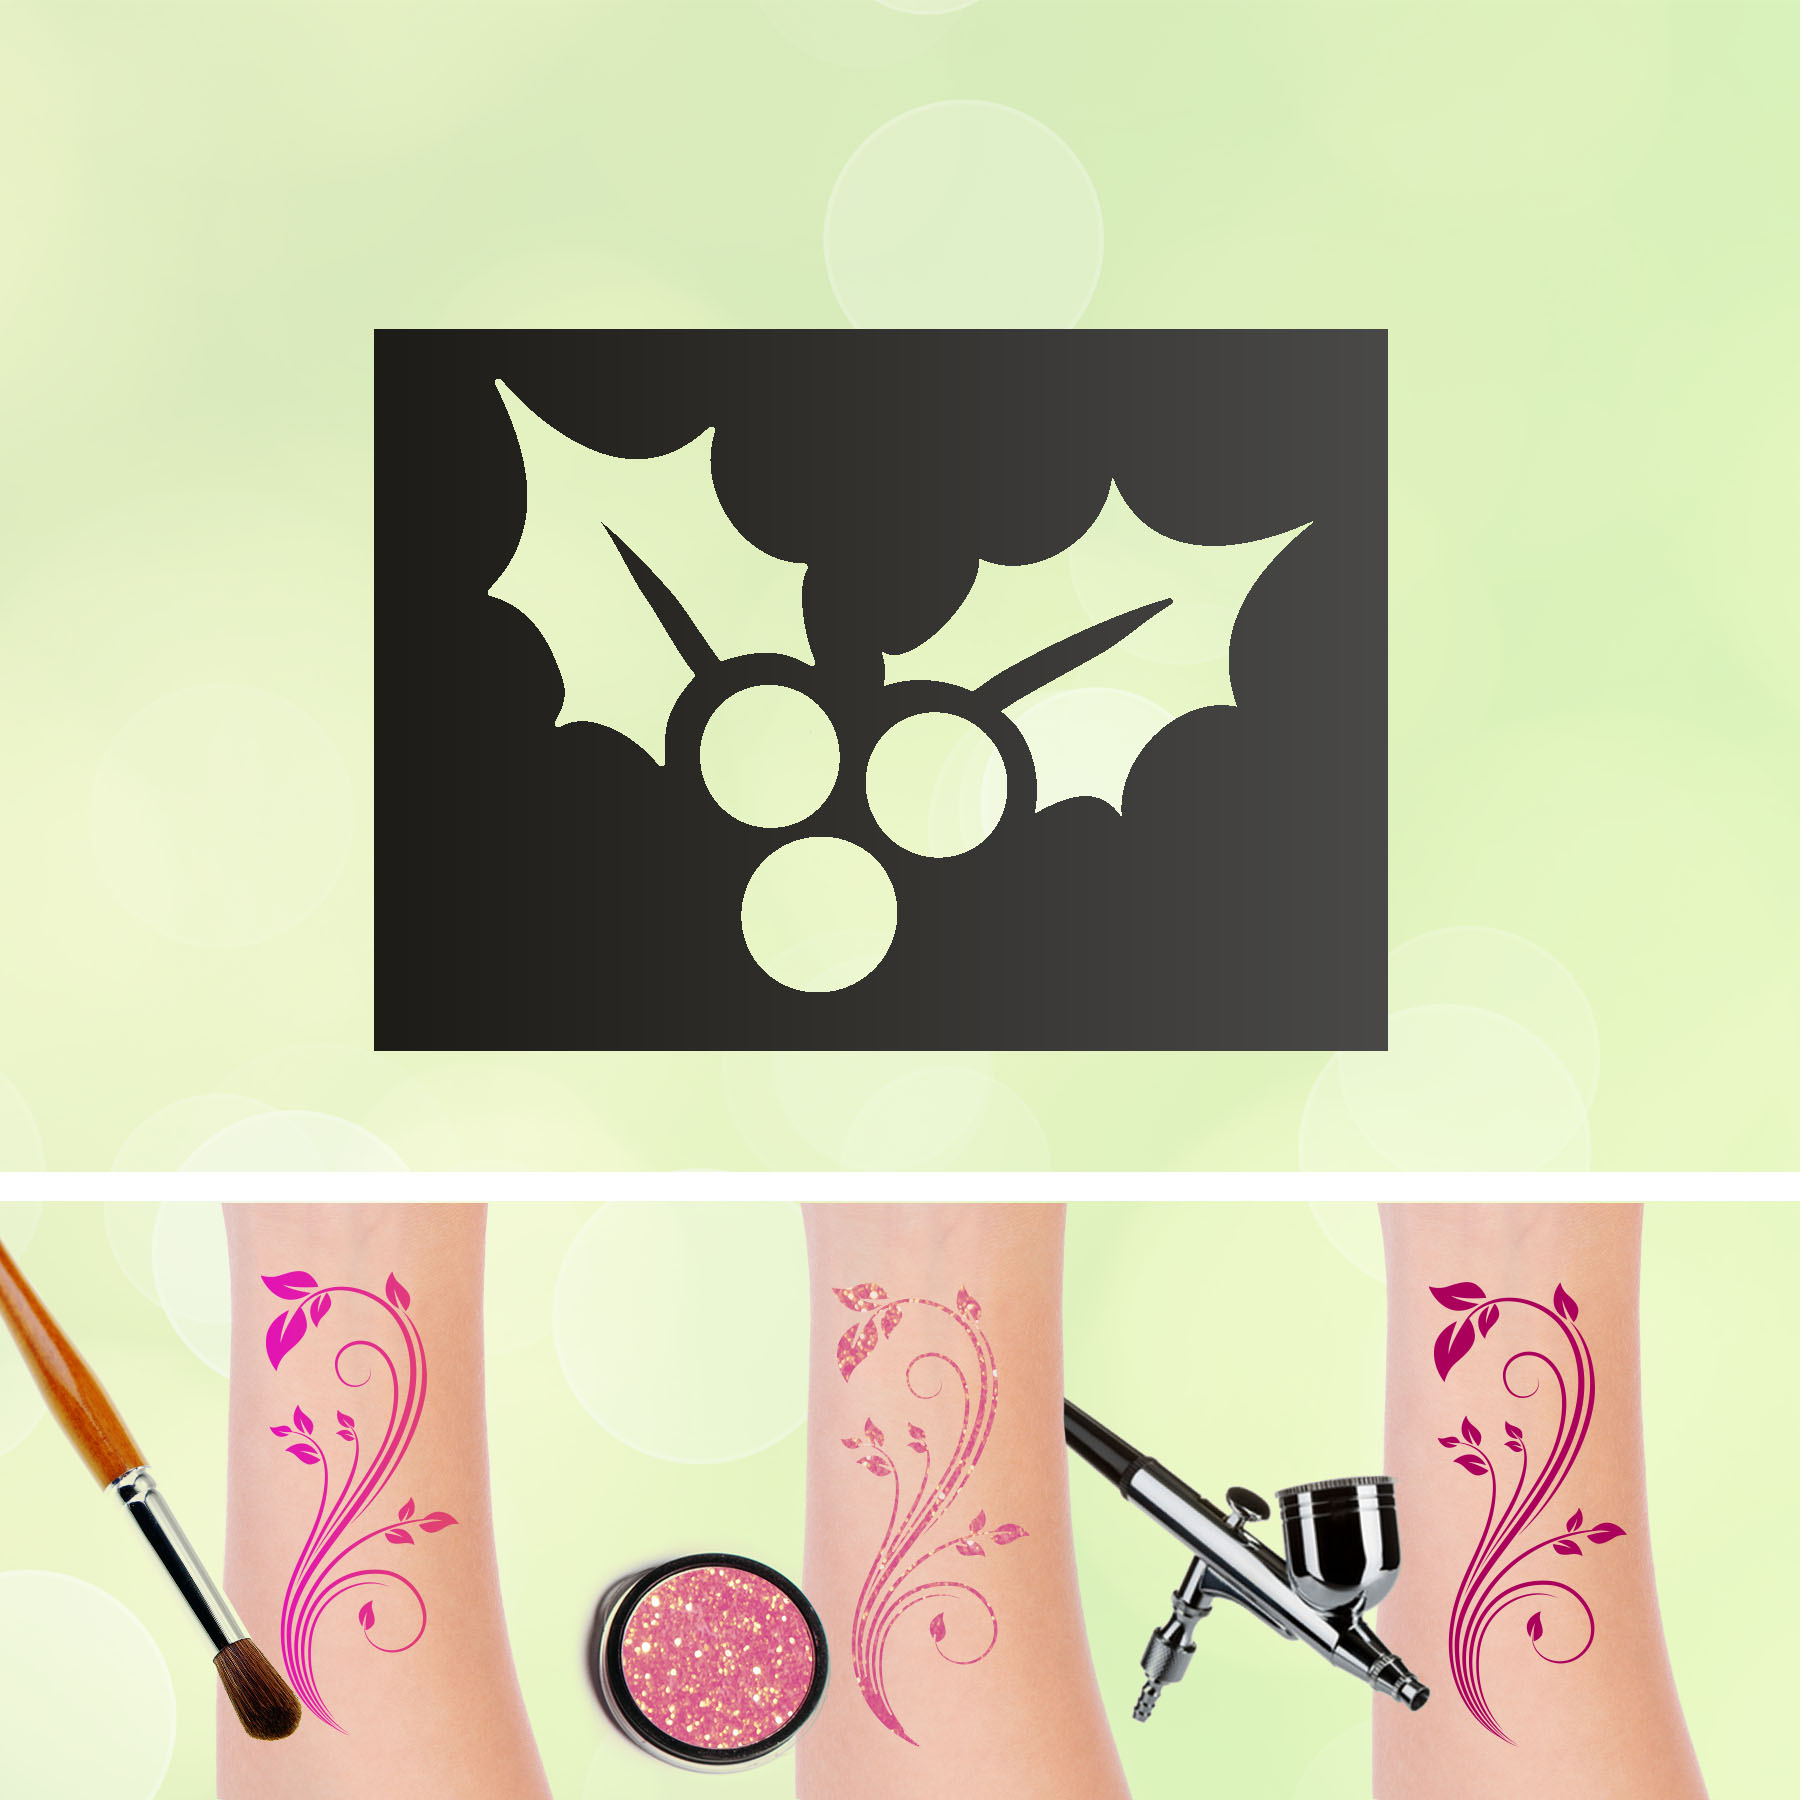 Tattoo Schablonen Lorbeerblatt Selbstklebend Kinder Schminken Airbrush